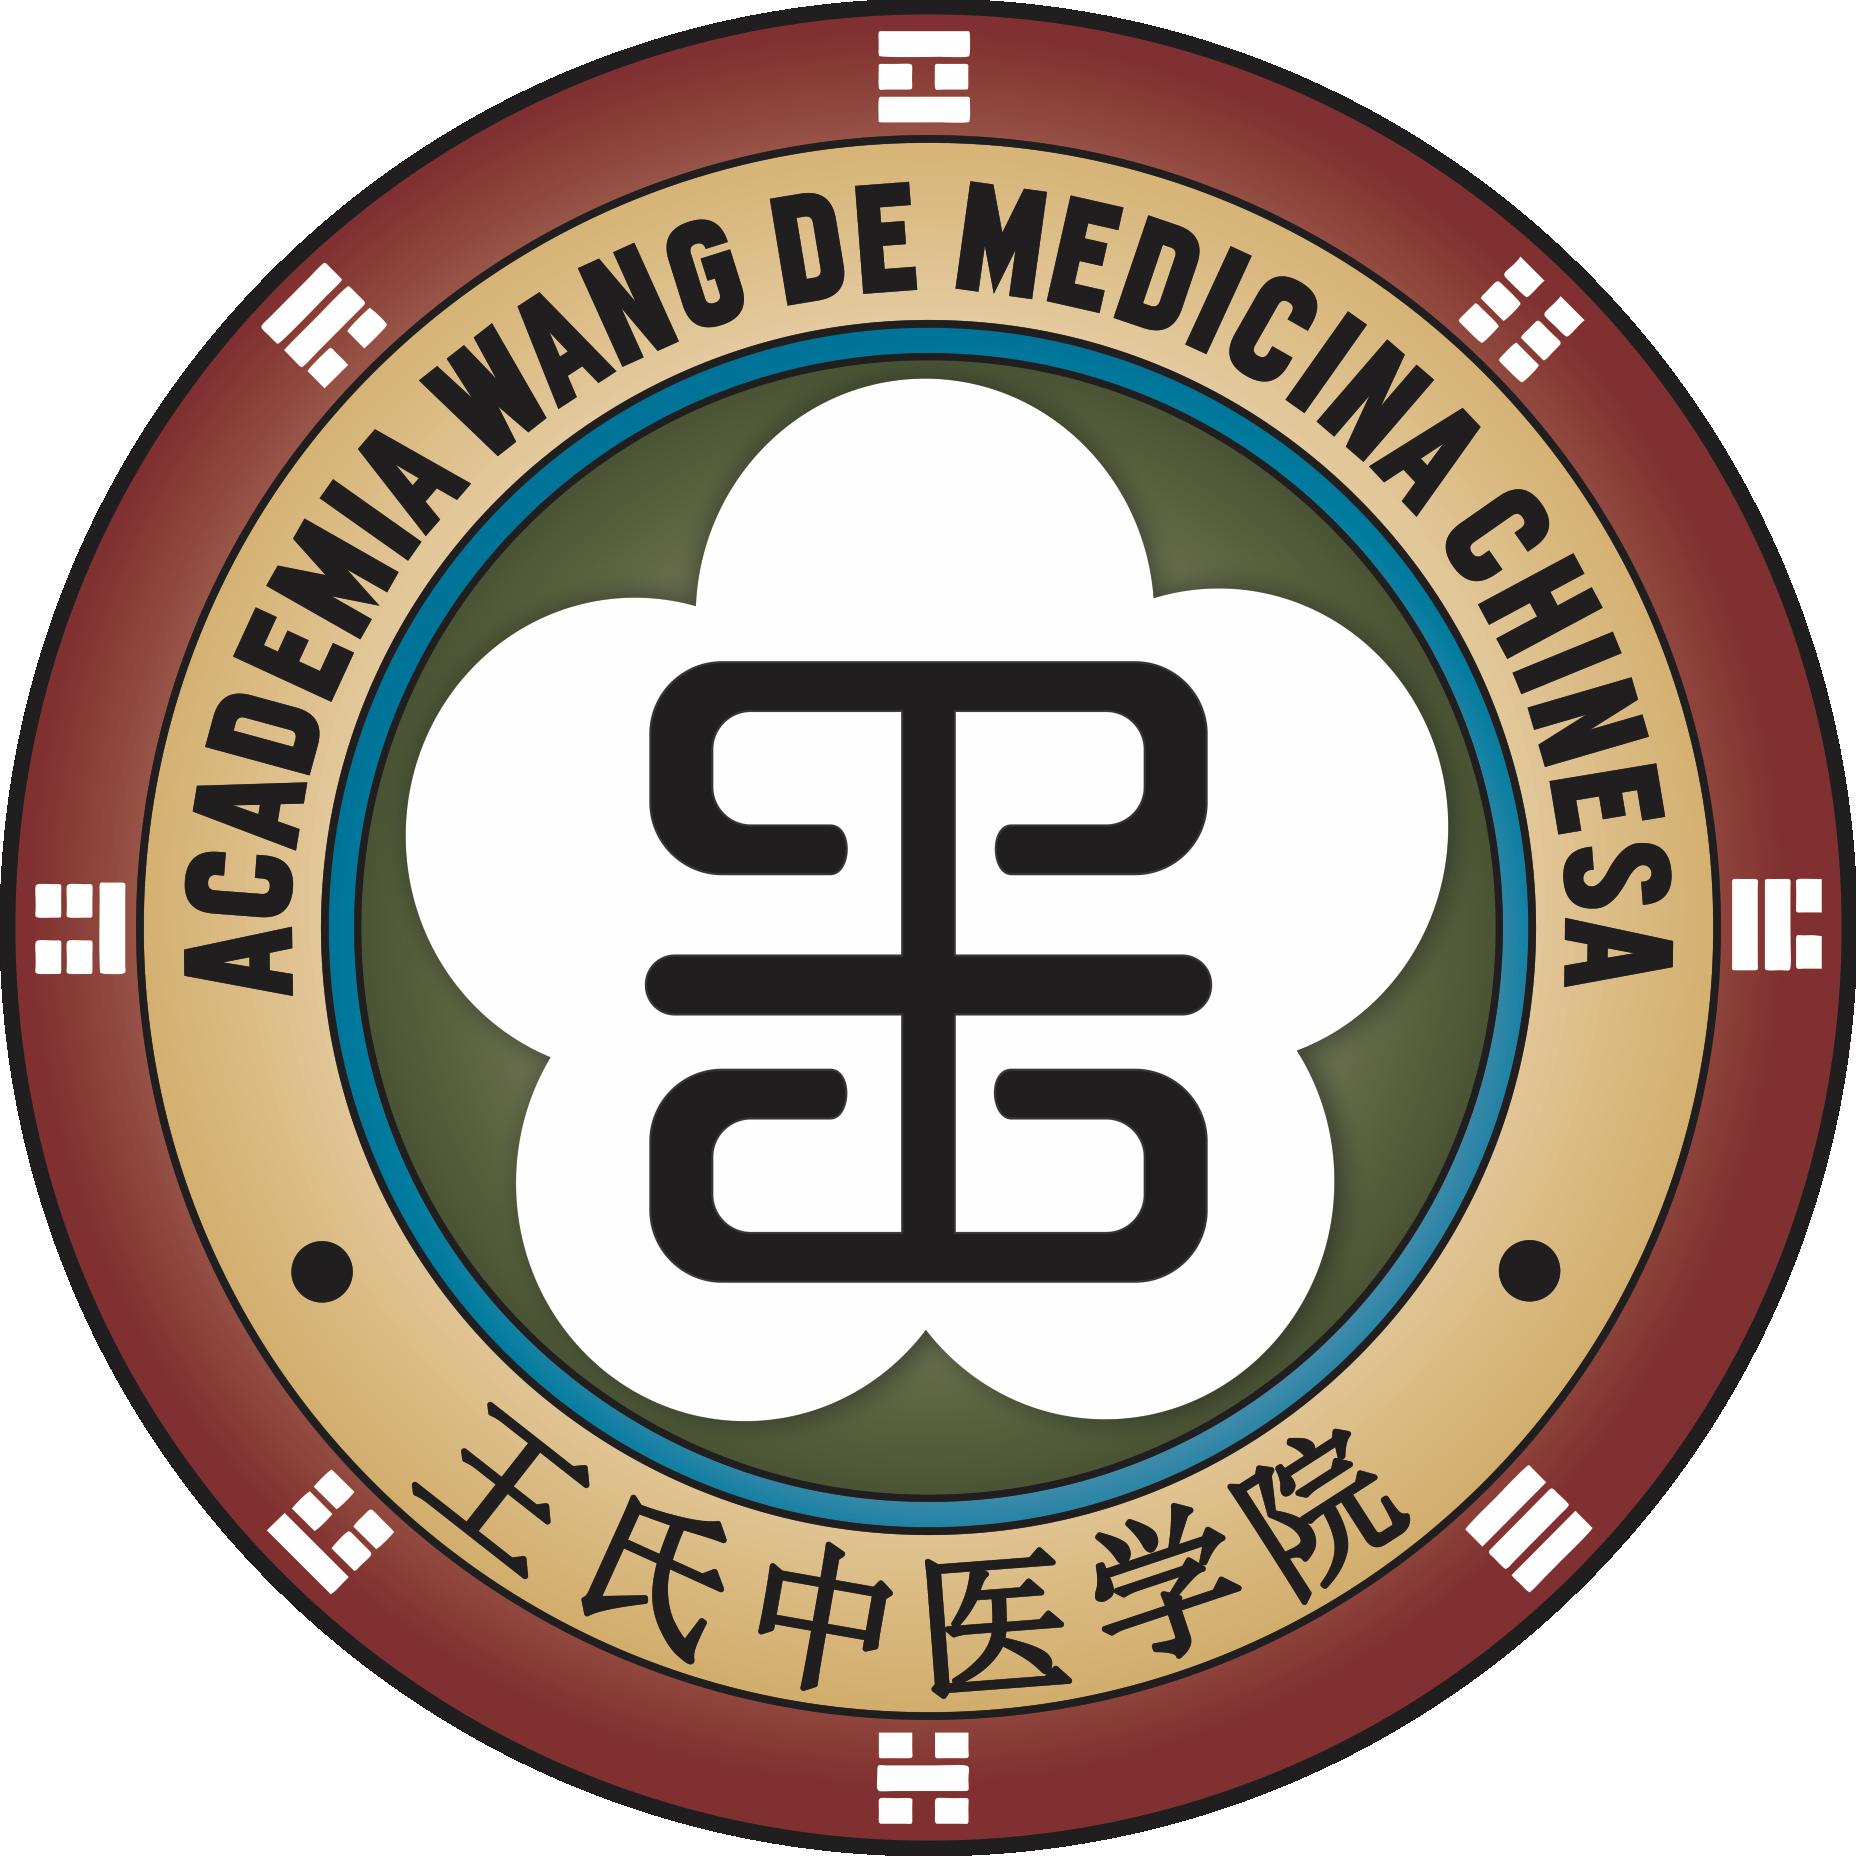 Academia Wang de Medicina Chinesa